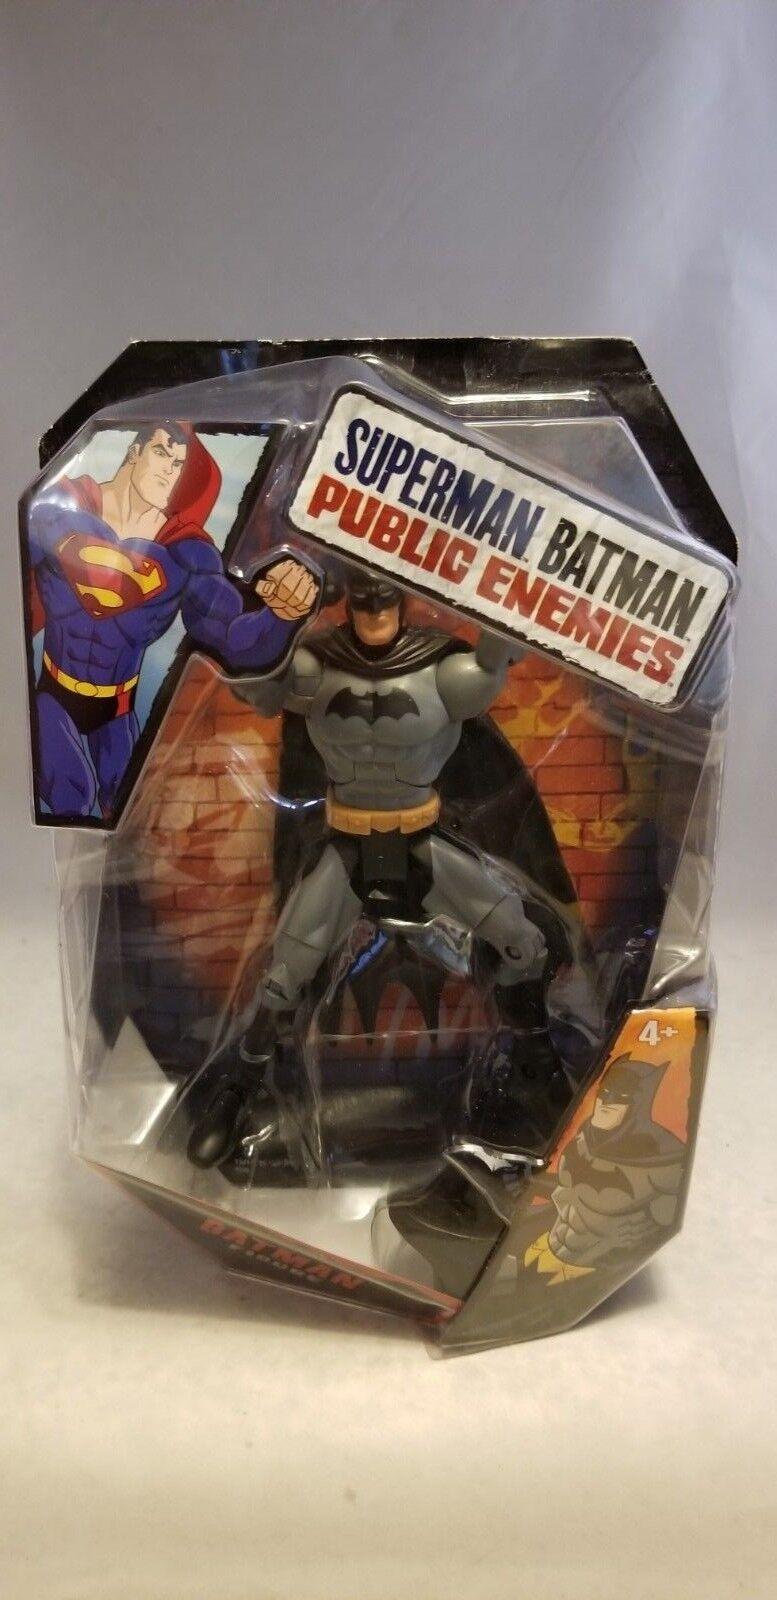 2009 SUPERMAN BATMAN PUBLIC ENEMIES BATMAN FIGURE